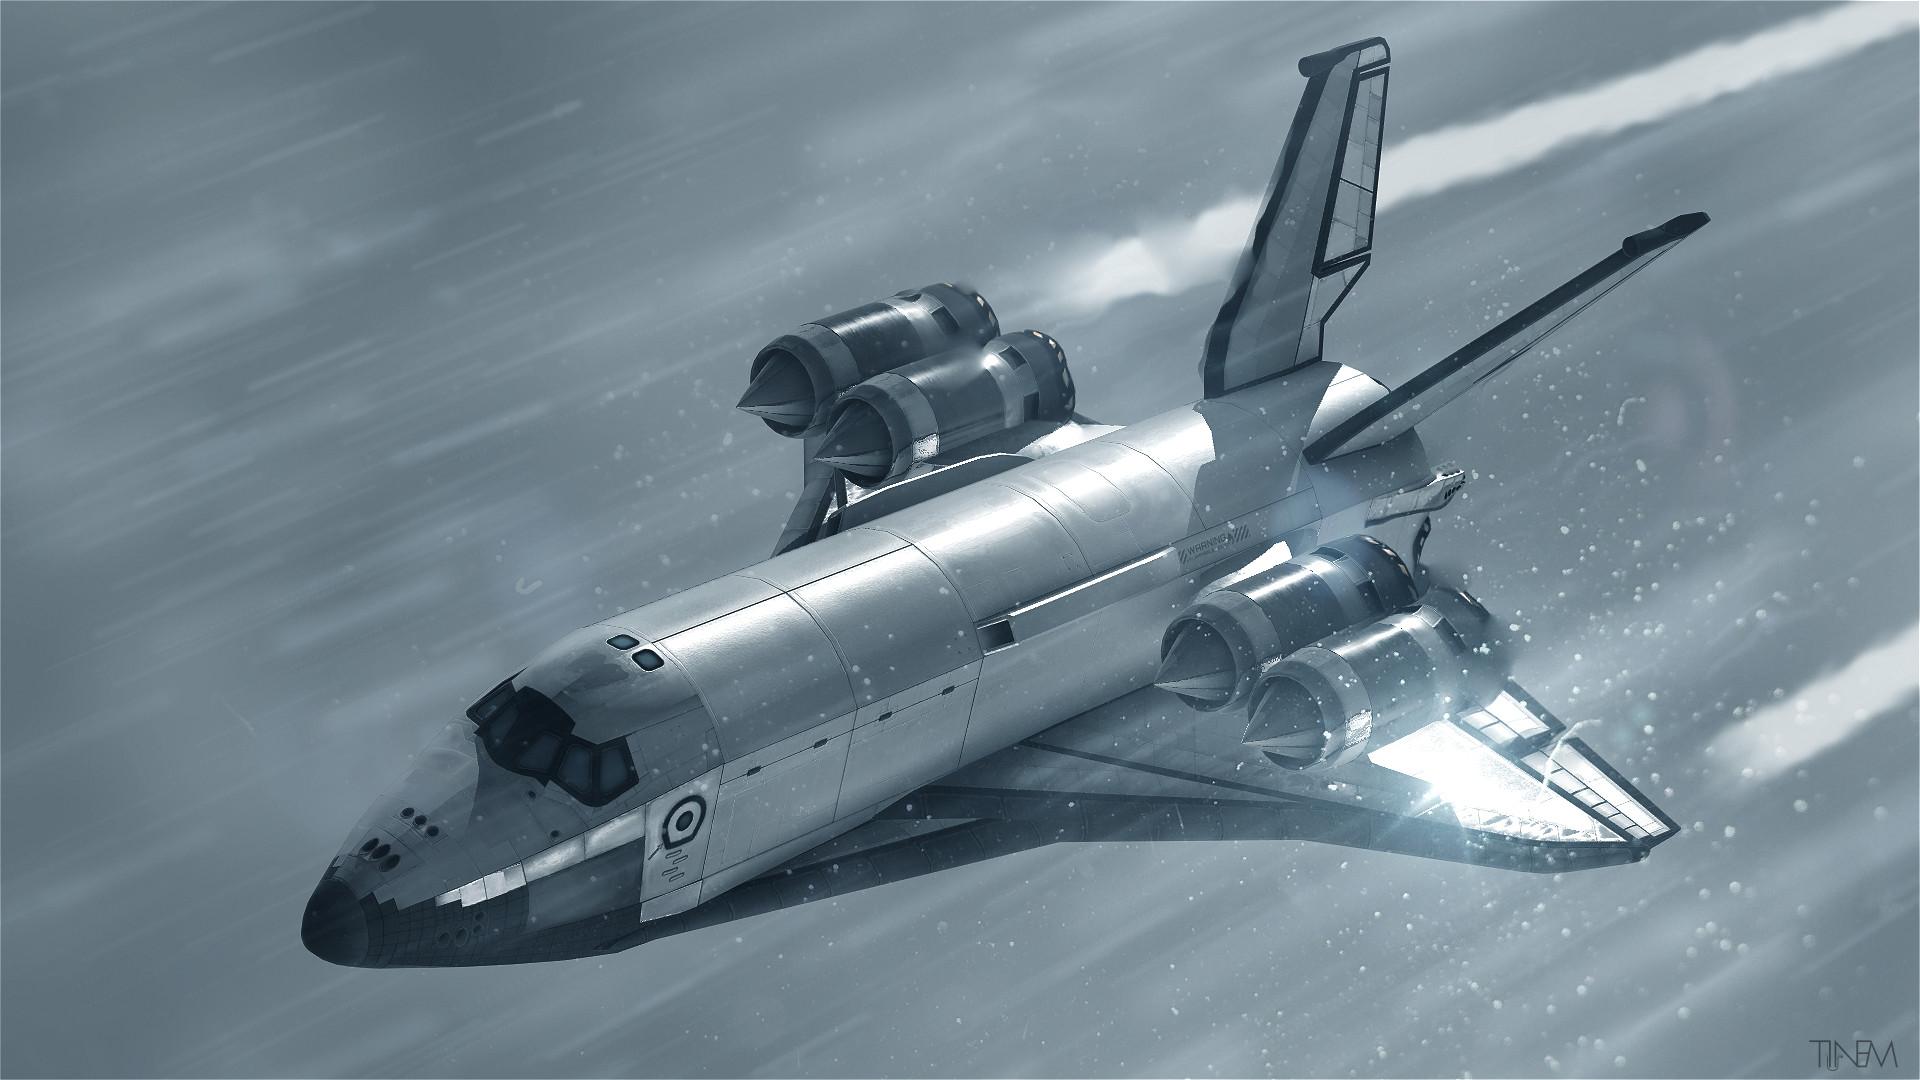 osman-taheri-shuttle-piercing-through-ra